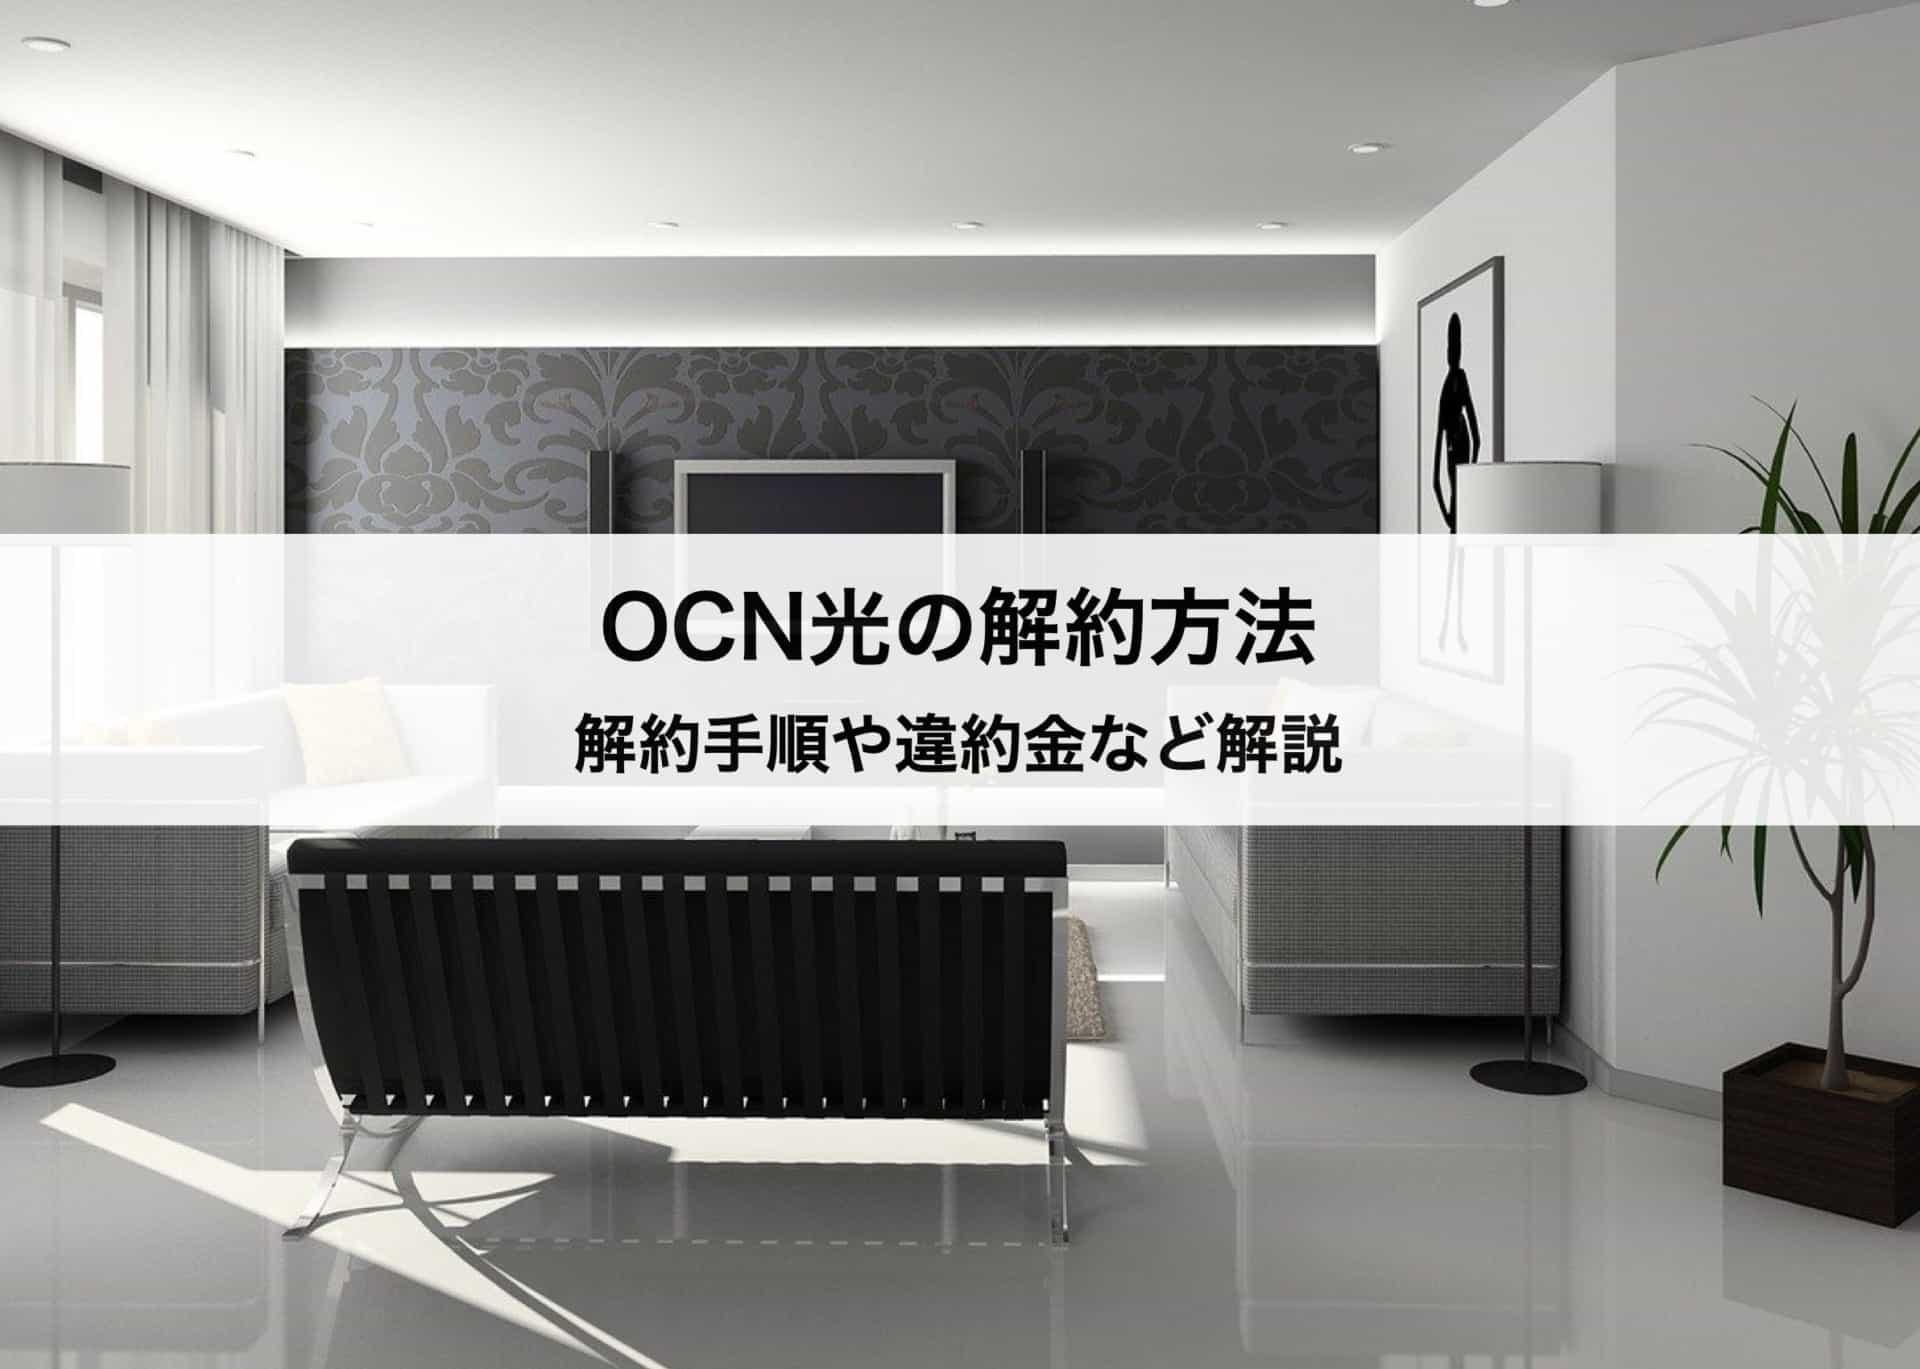 OCN光の解約方法|具体的な解約手順から違約金、おすすめの乗り換え先も紹介します!